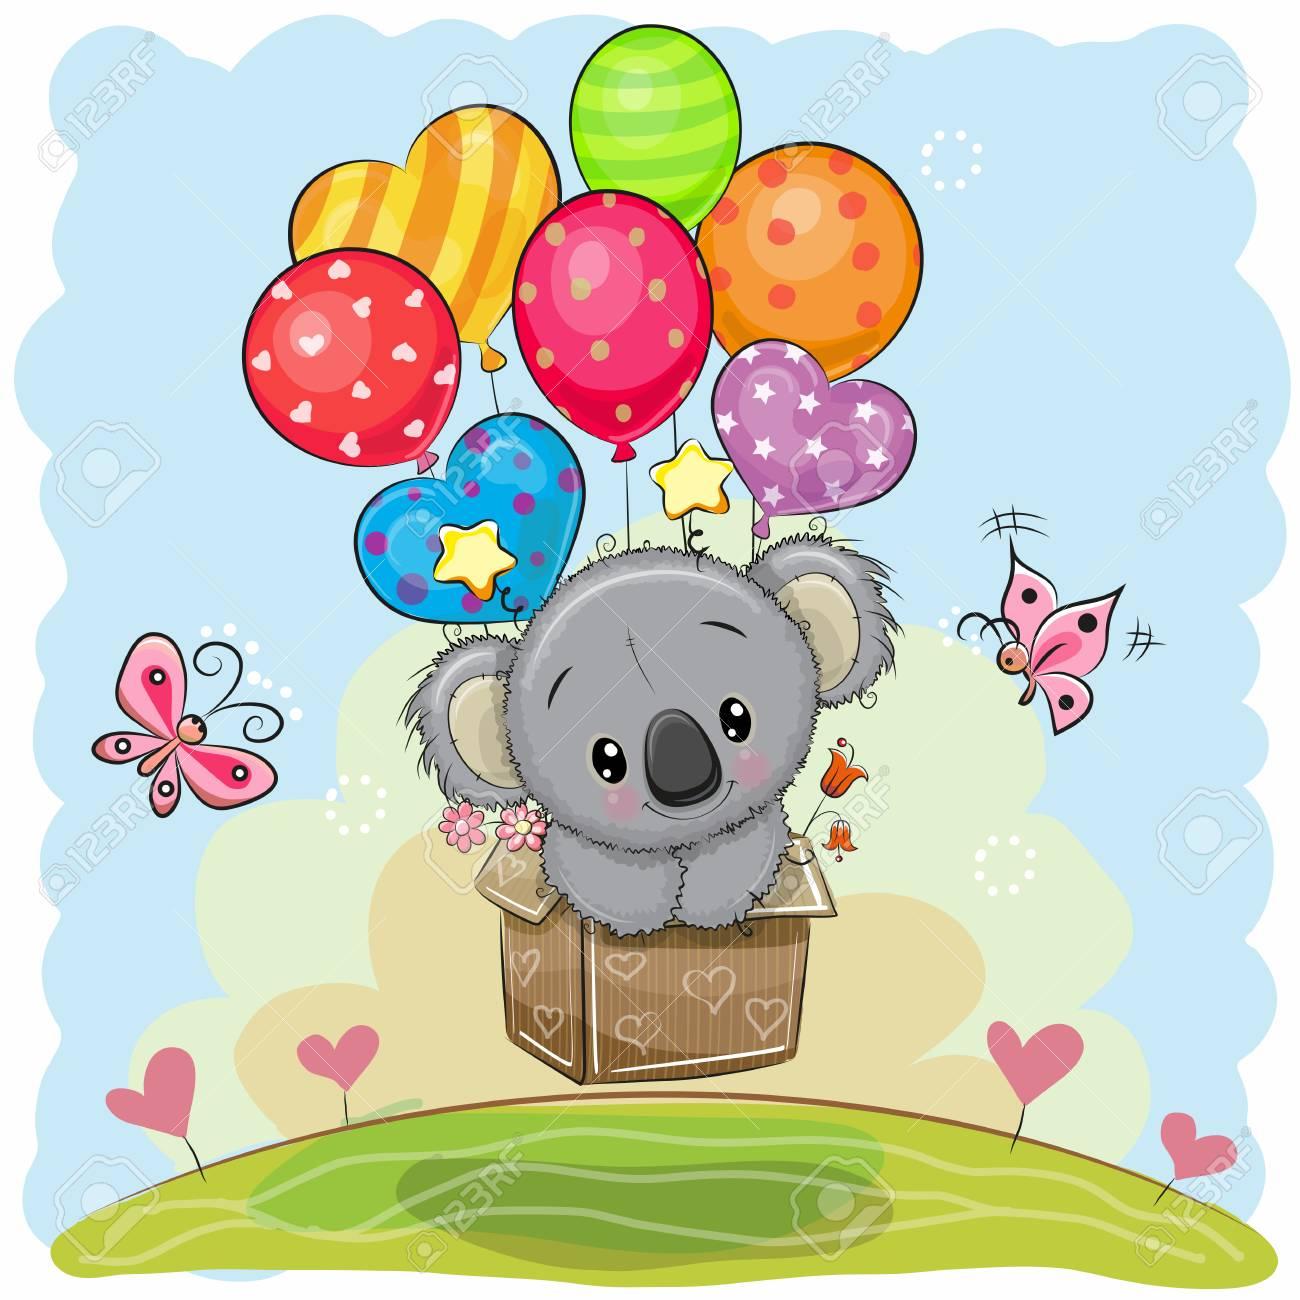 Cute Cartoon Koala in the box is flying on balloons - 88086181